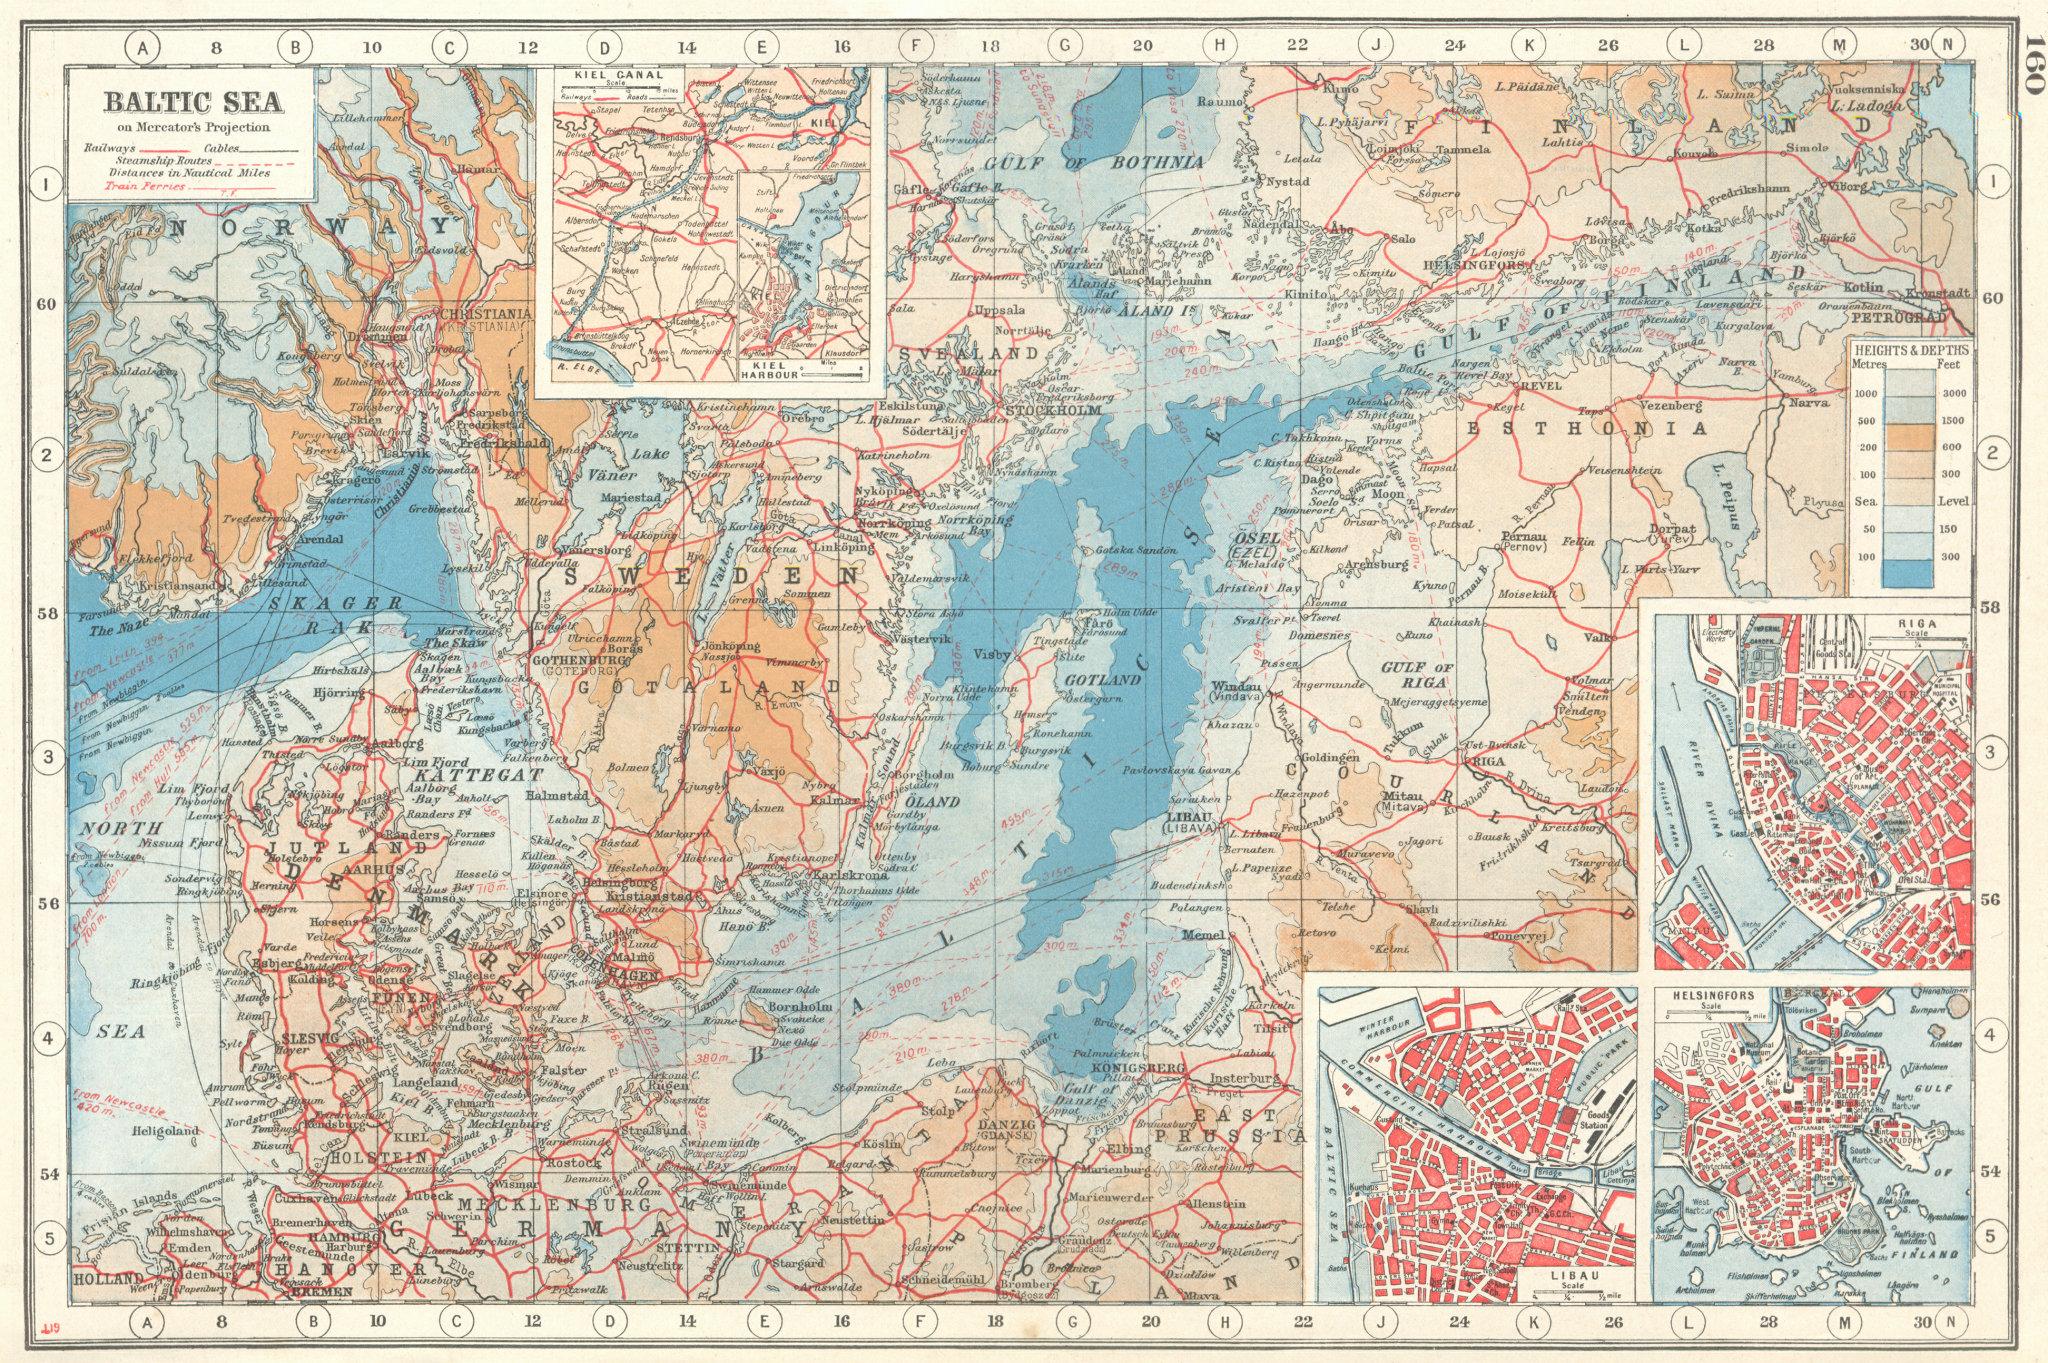 Associate Product BALTIC SEA. inset Kiel Canal; Riga; Libau (Liepaja); Helsinki 1920 old map